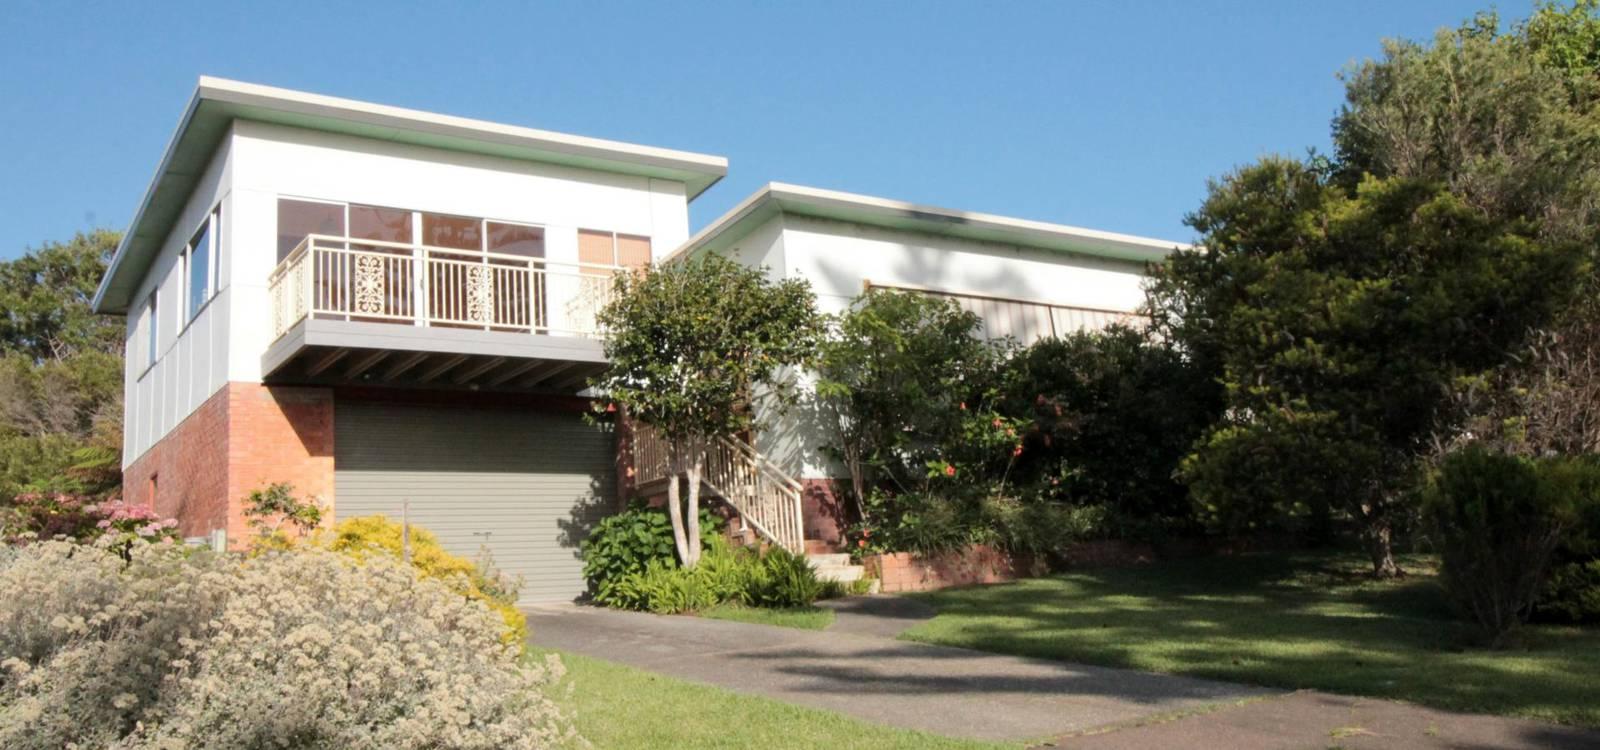 12 Monash Avenue TUROSS HEAD, NSW 2537 - photo 1